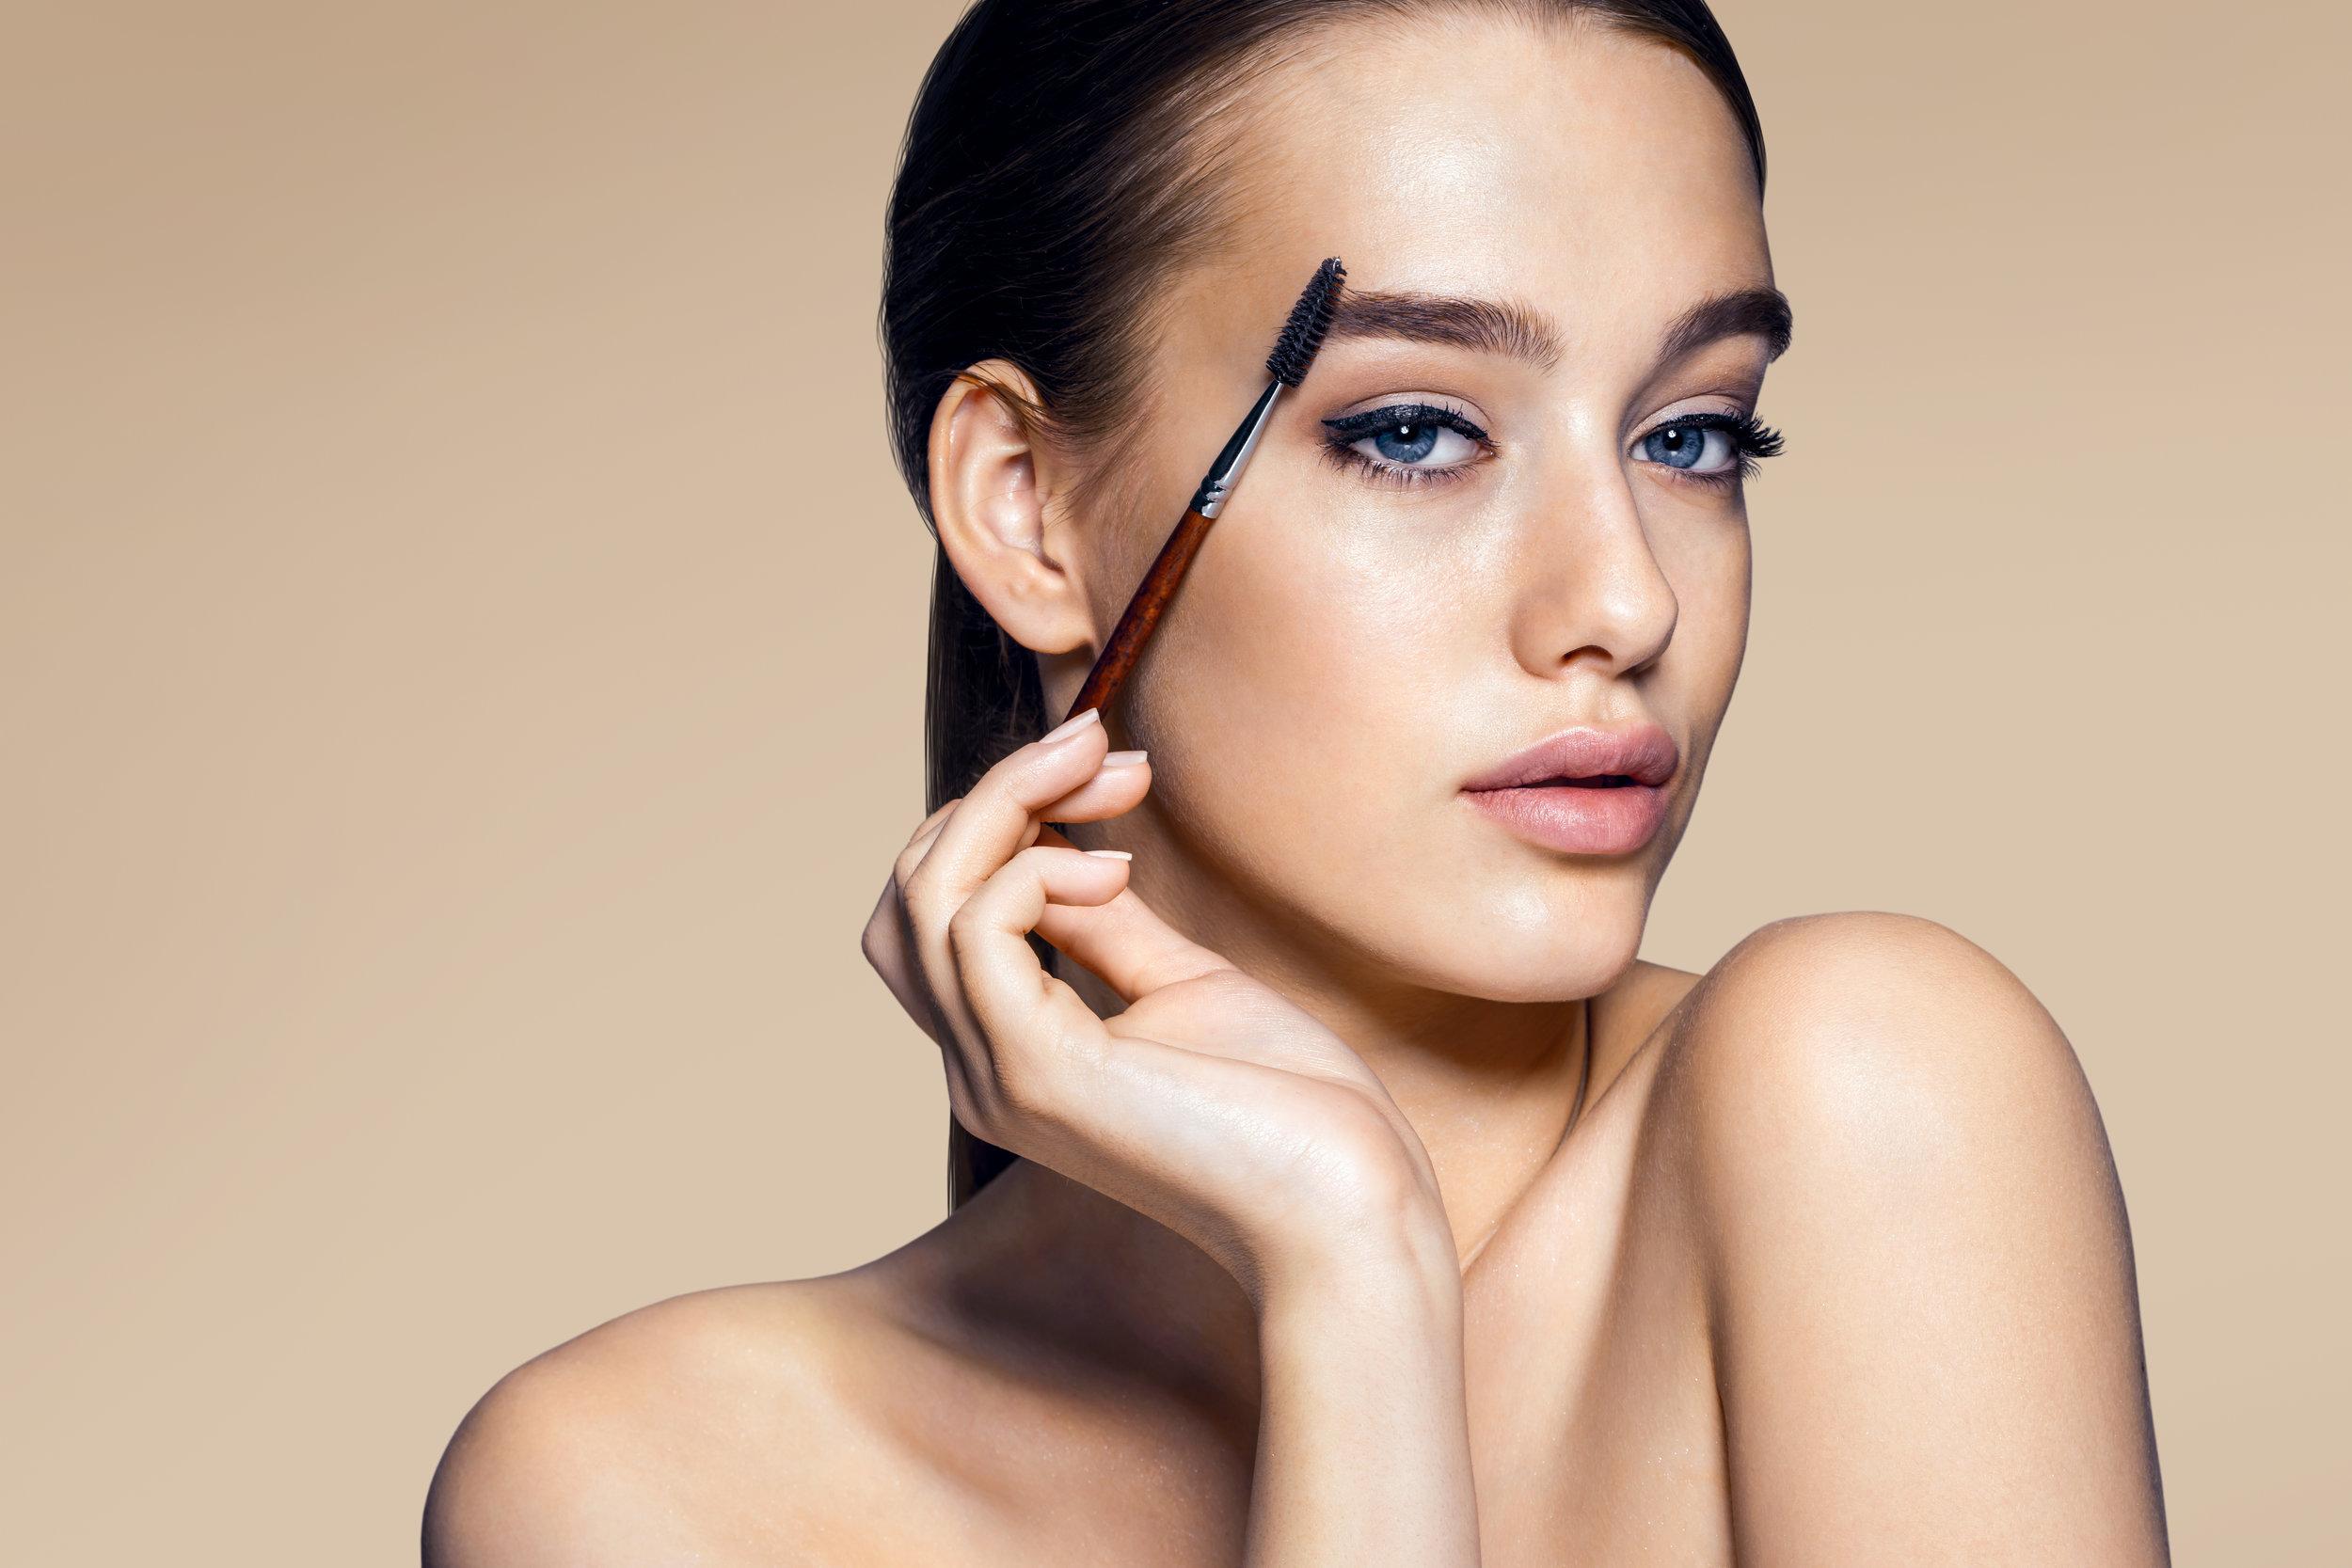 AdobeStock_87296540 using mascara.jpeg